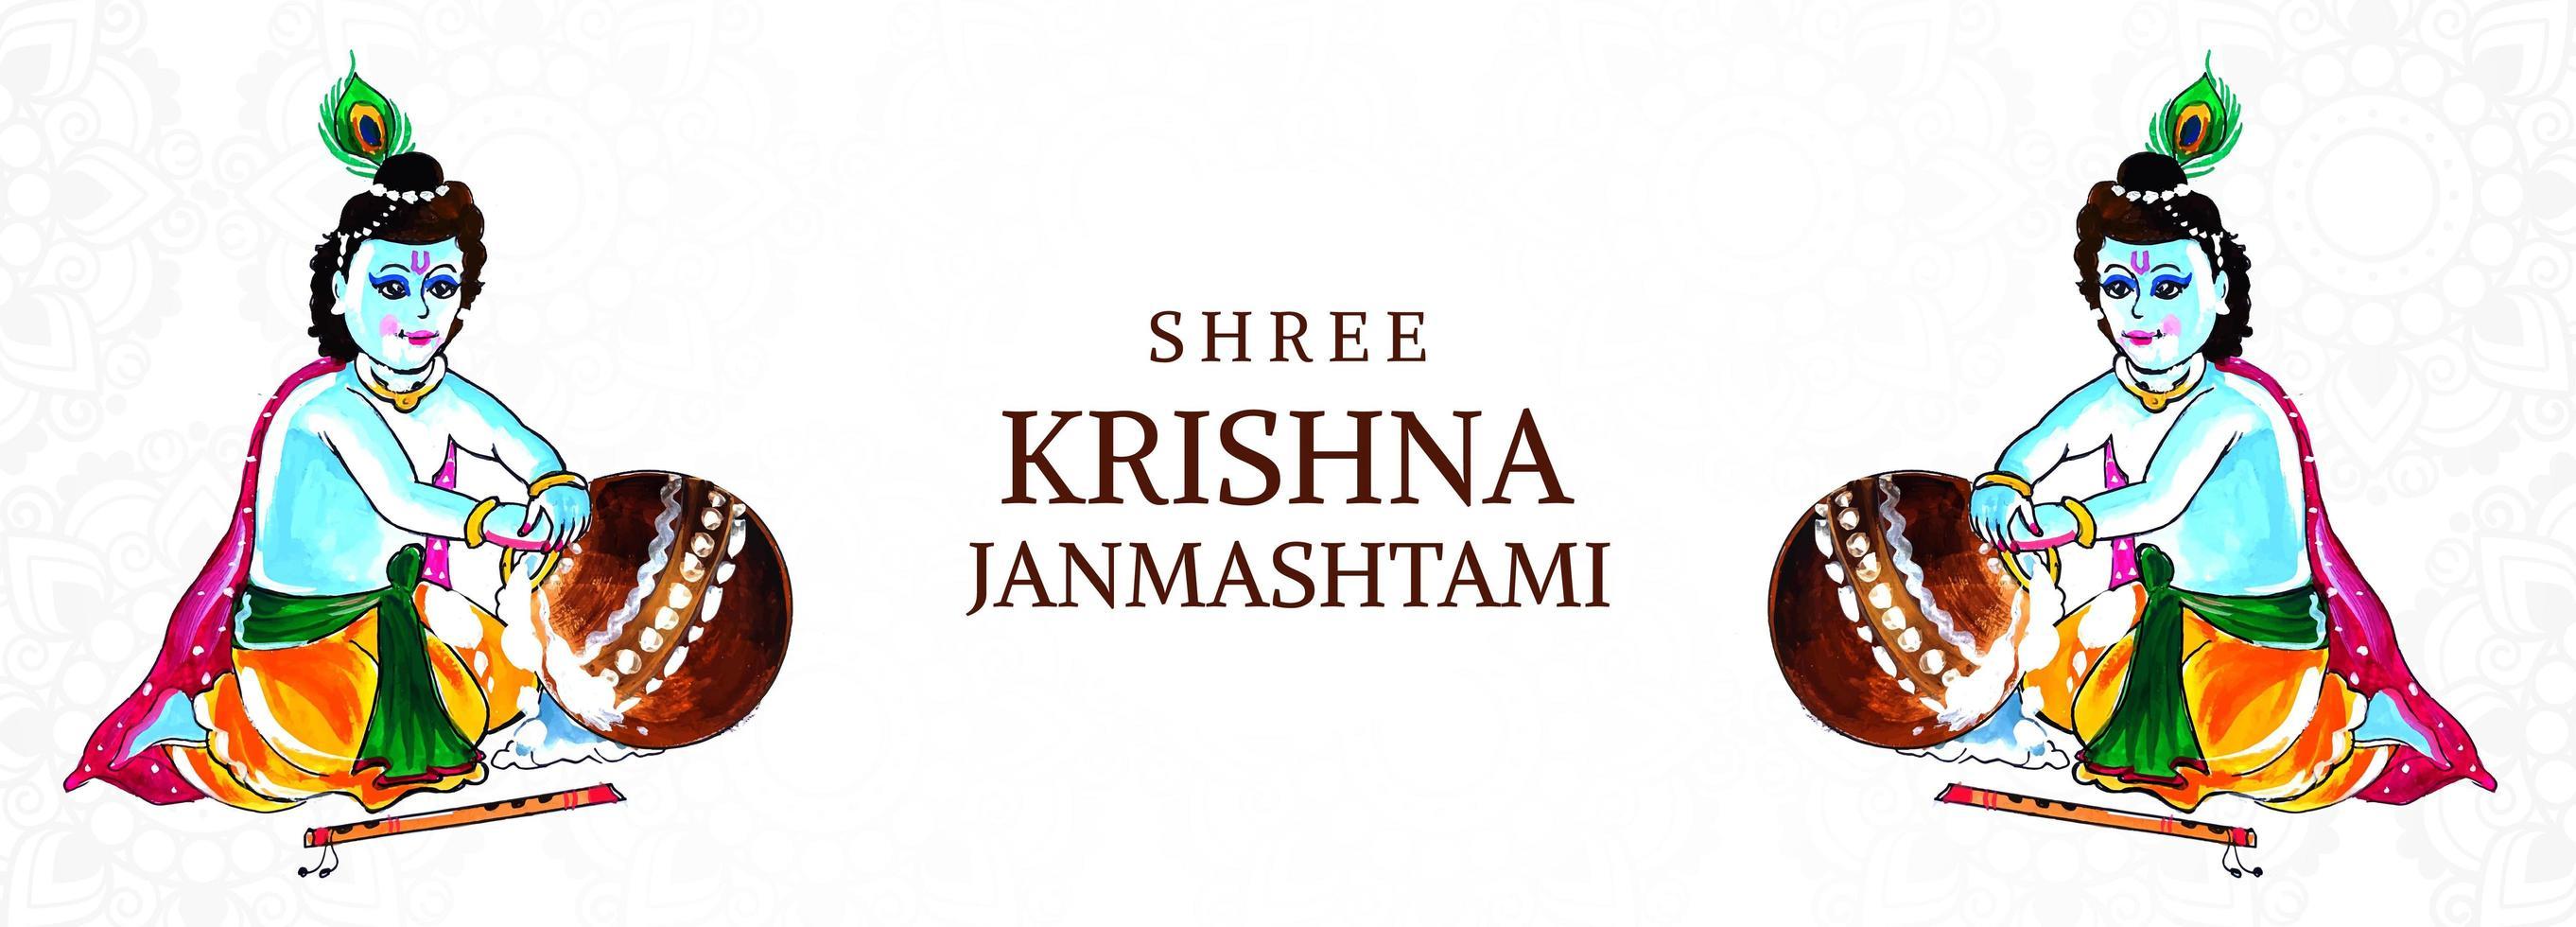 krishna sätter hand i grötkanna janmashtami festival kort banner vektor